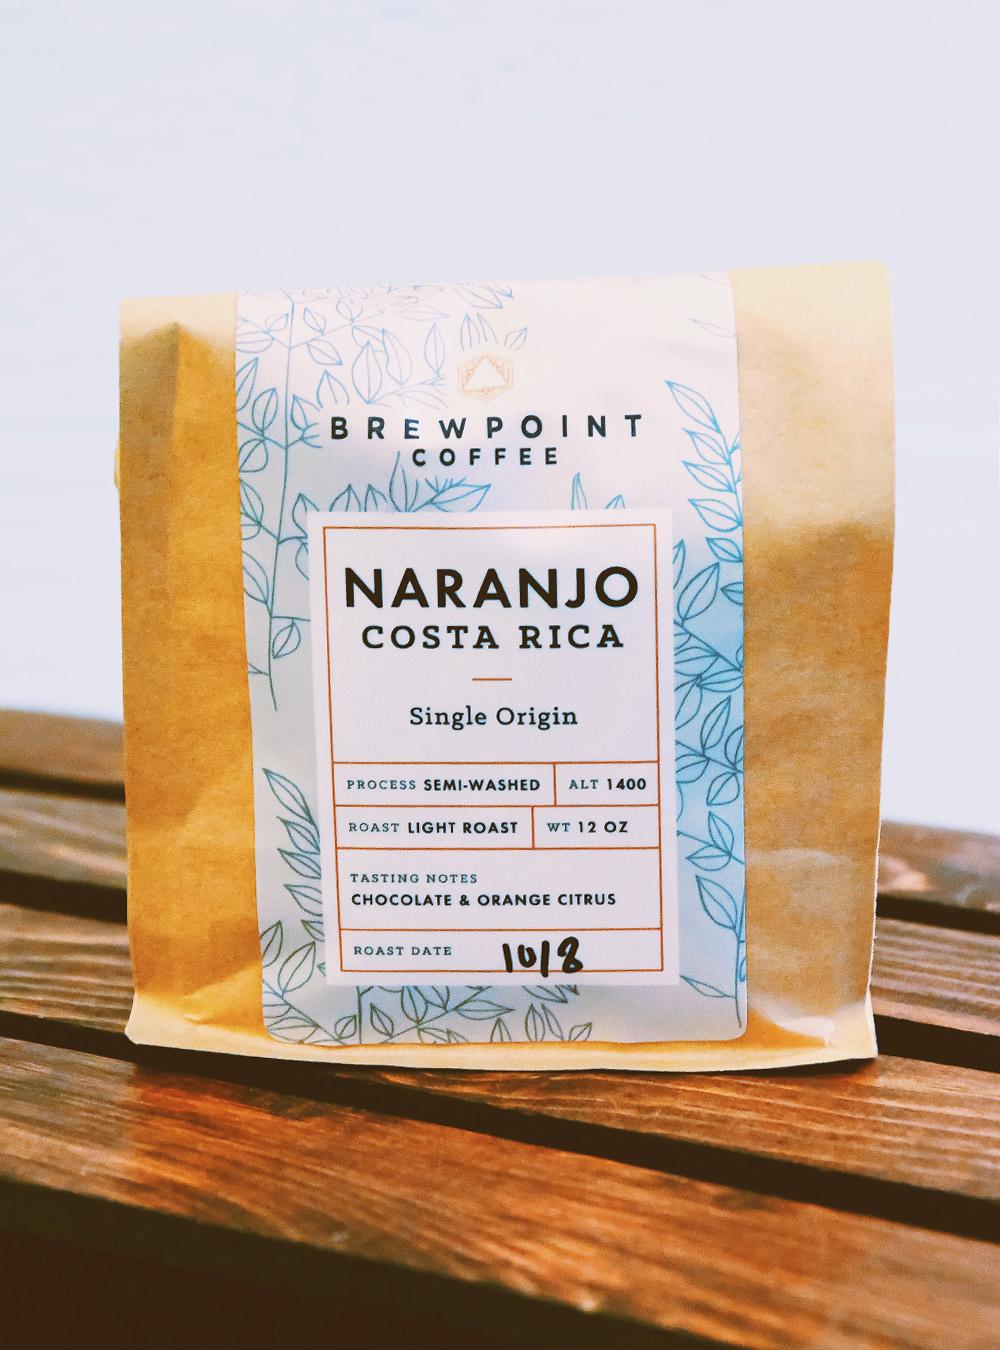 Packaging design for Brewpoint Coffee's single origin Naranjo coffee.